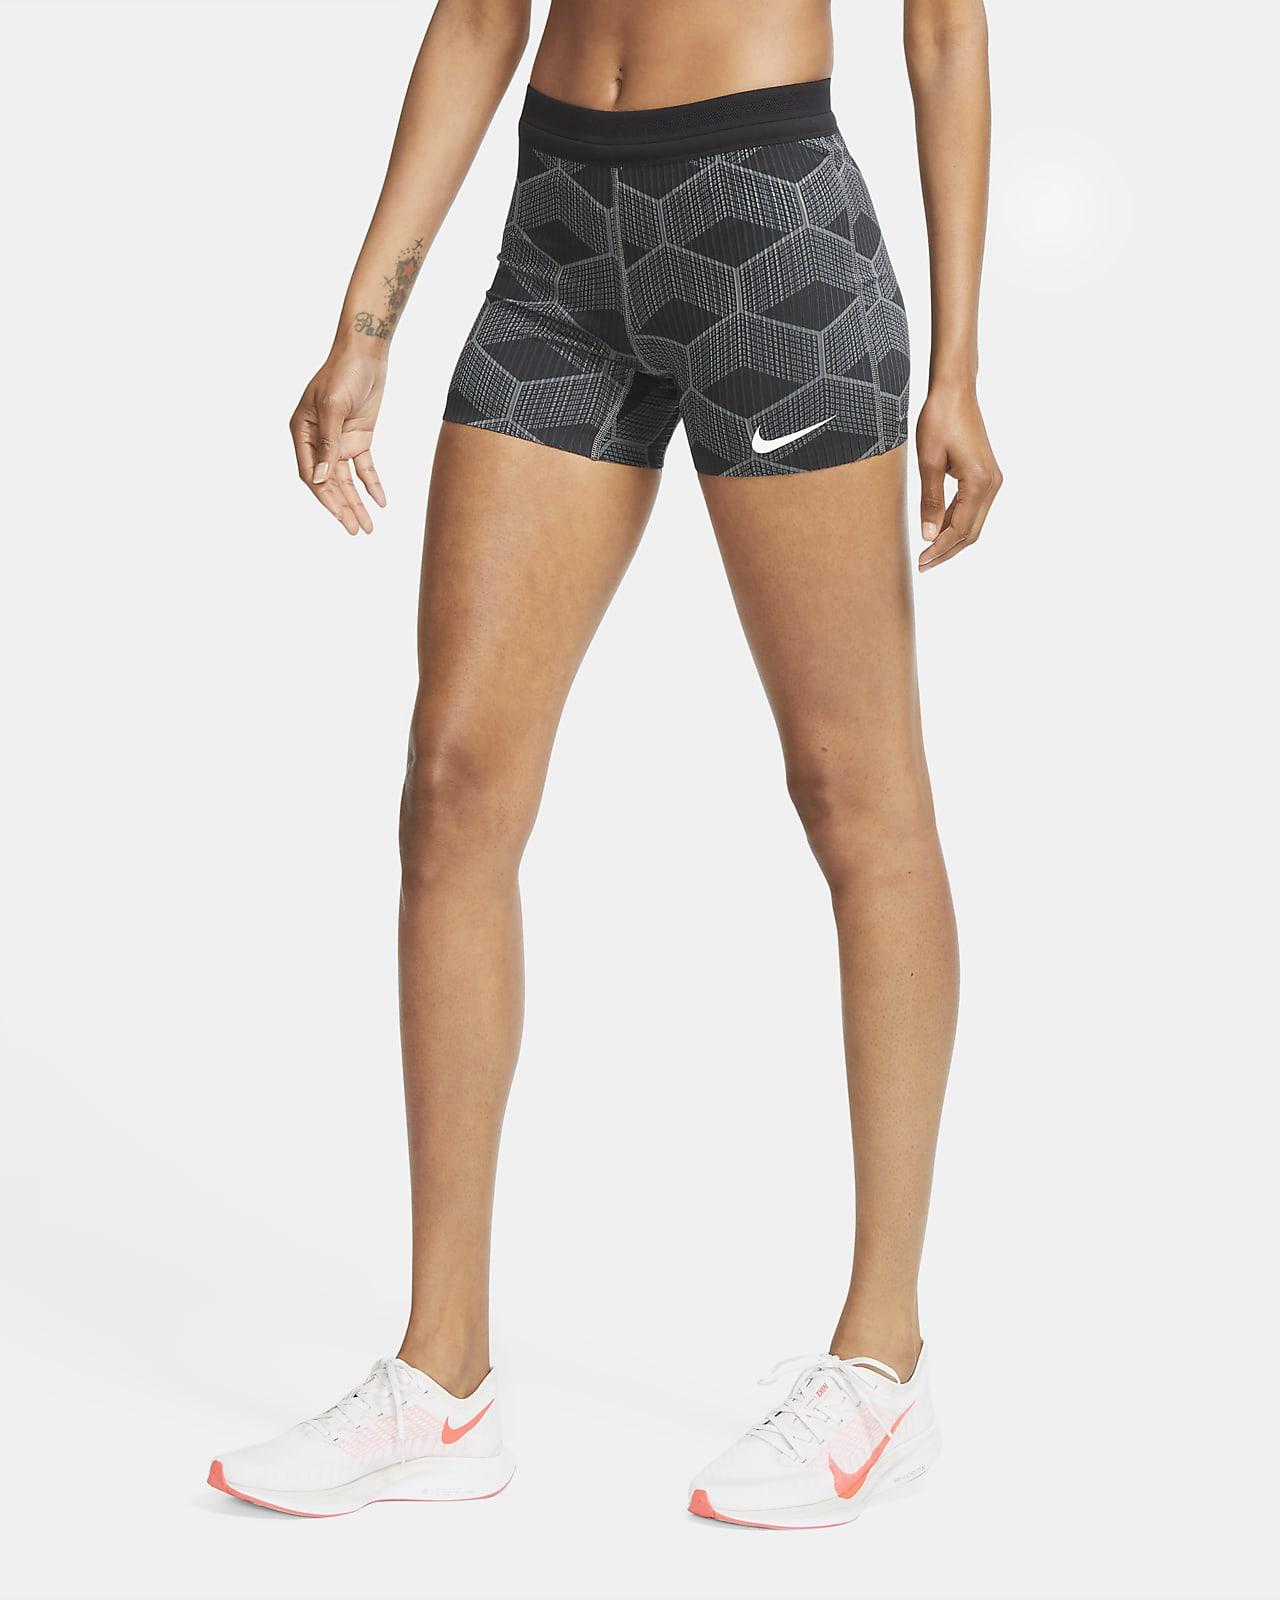 Nike Dri-FIT ADV Team Kenya AeroSwift Women's Tight Running Shorts